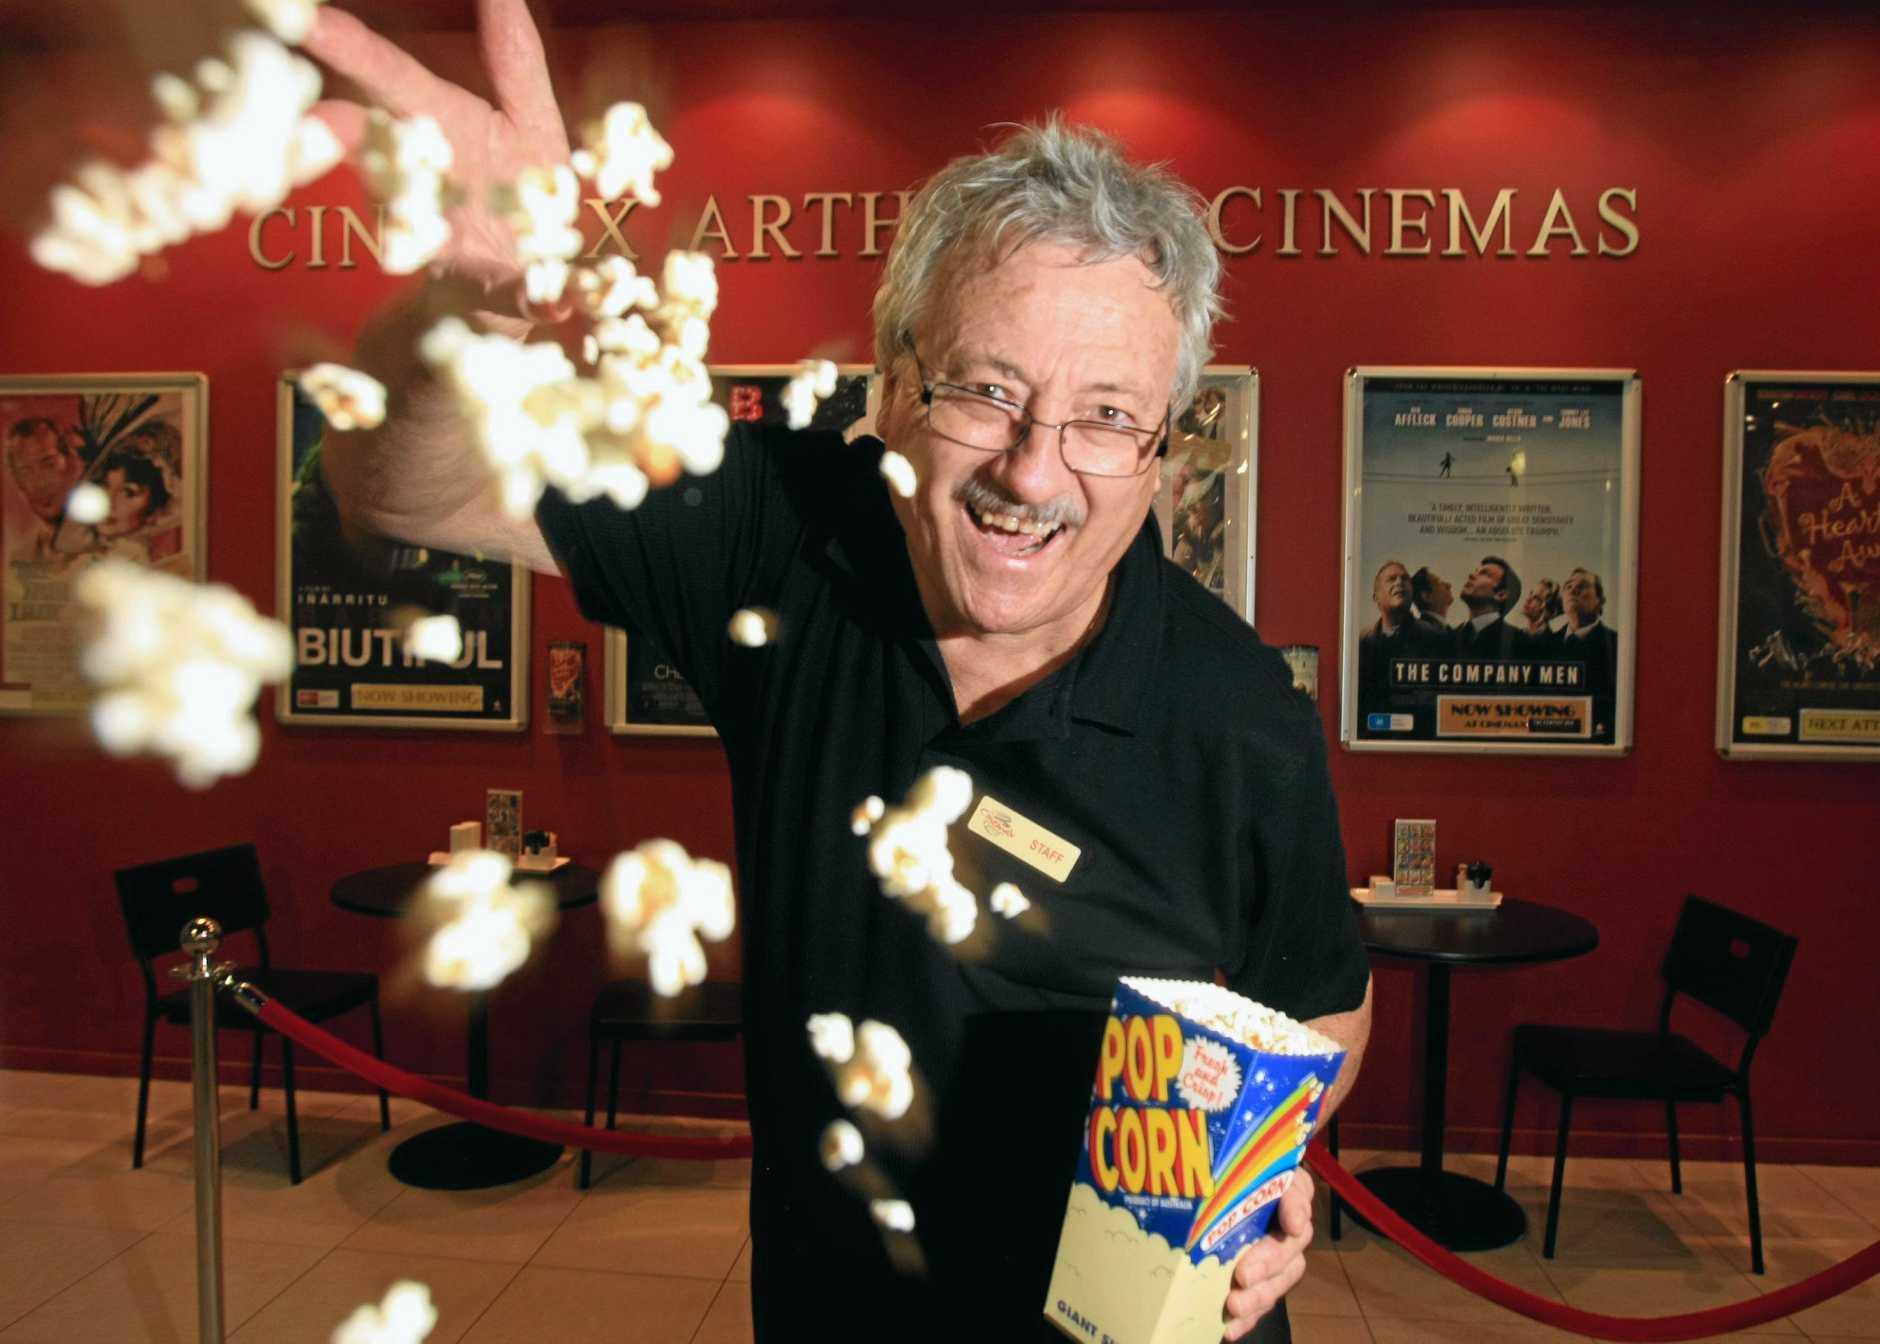 Stephen Buge at Kingscliff Cinemax Cinema.